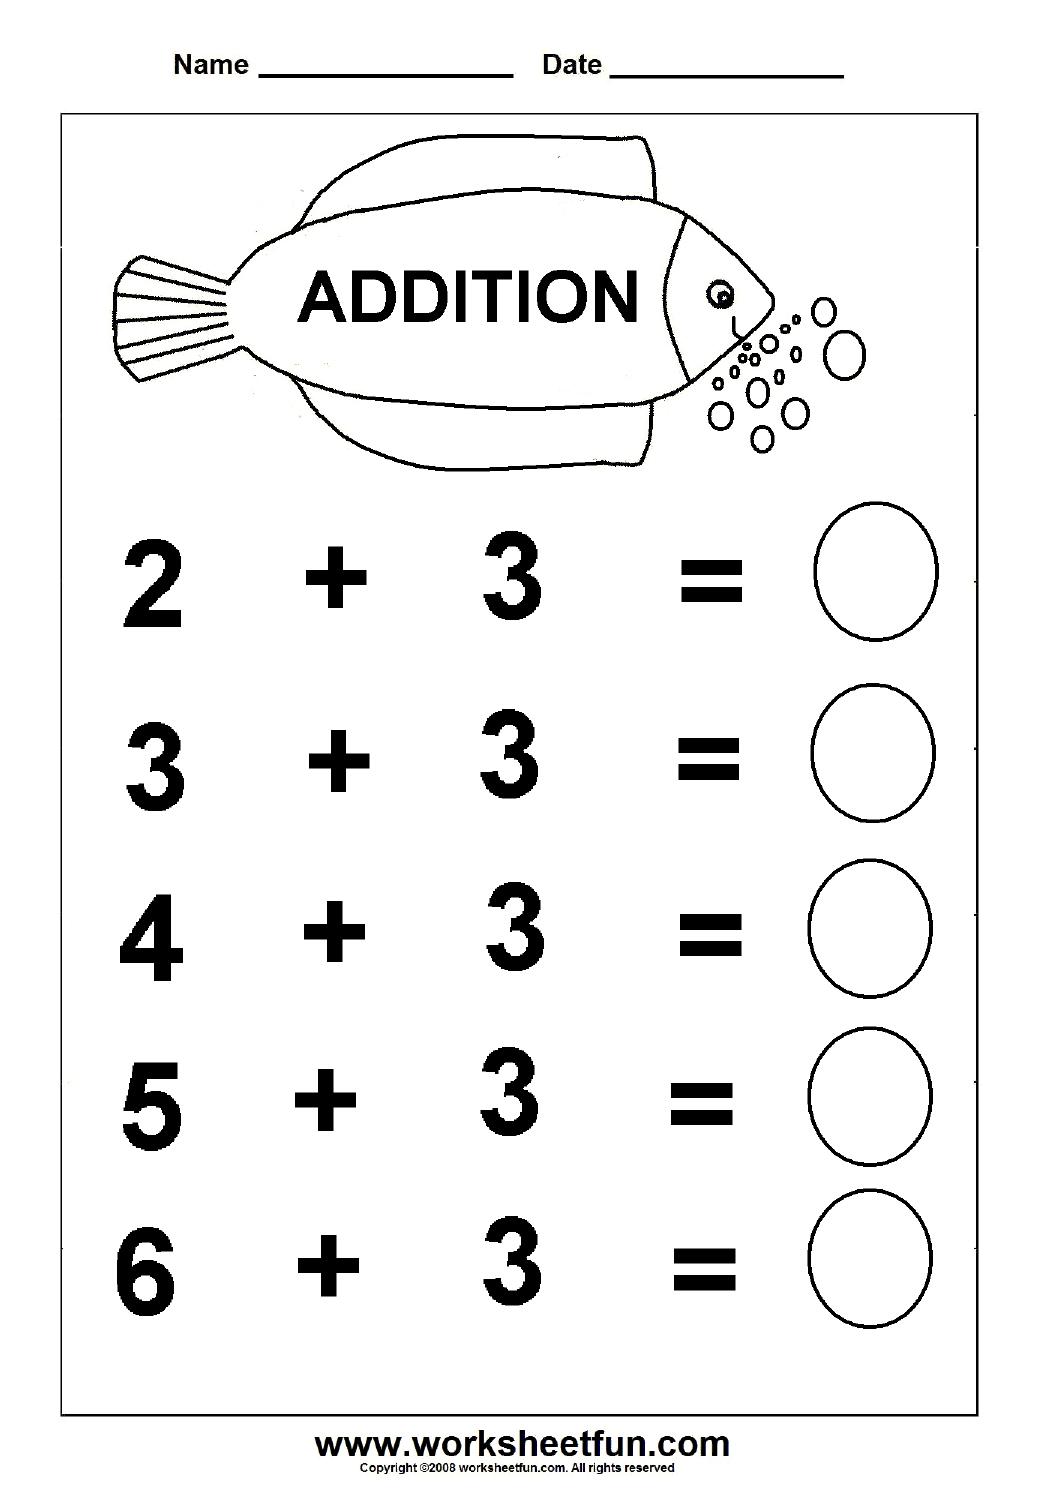 Beginner Addition – 6 Kindergarten Addition Worksheets / Free - Free Printable Kindergarten Addition And Subtraction Worksheets